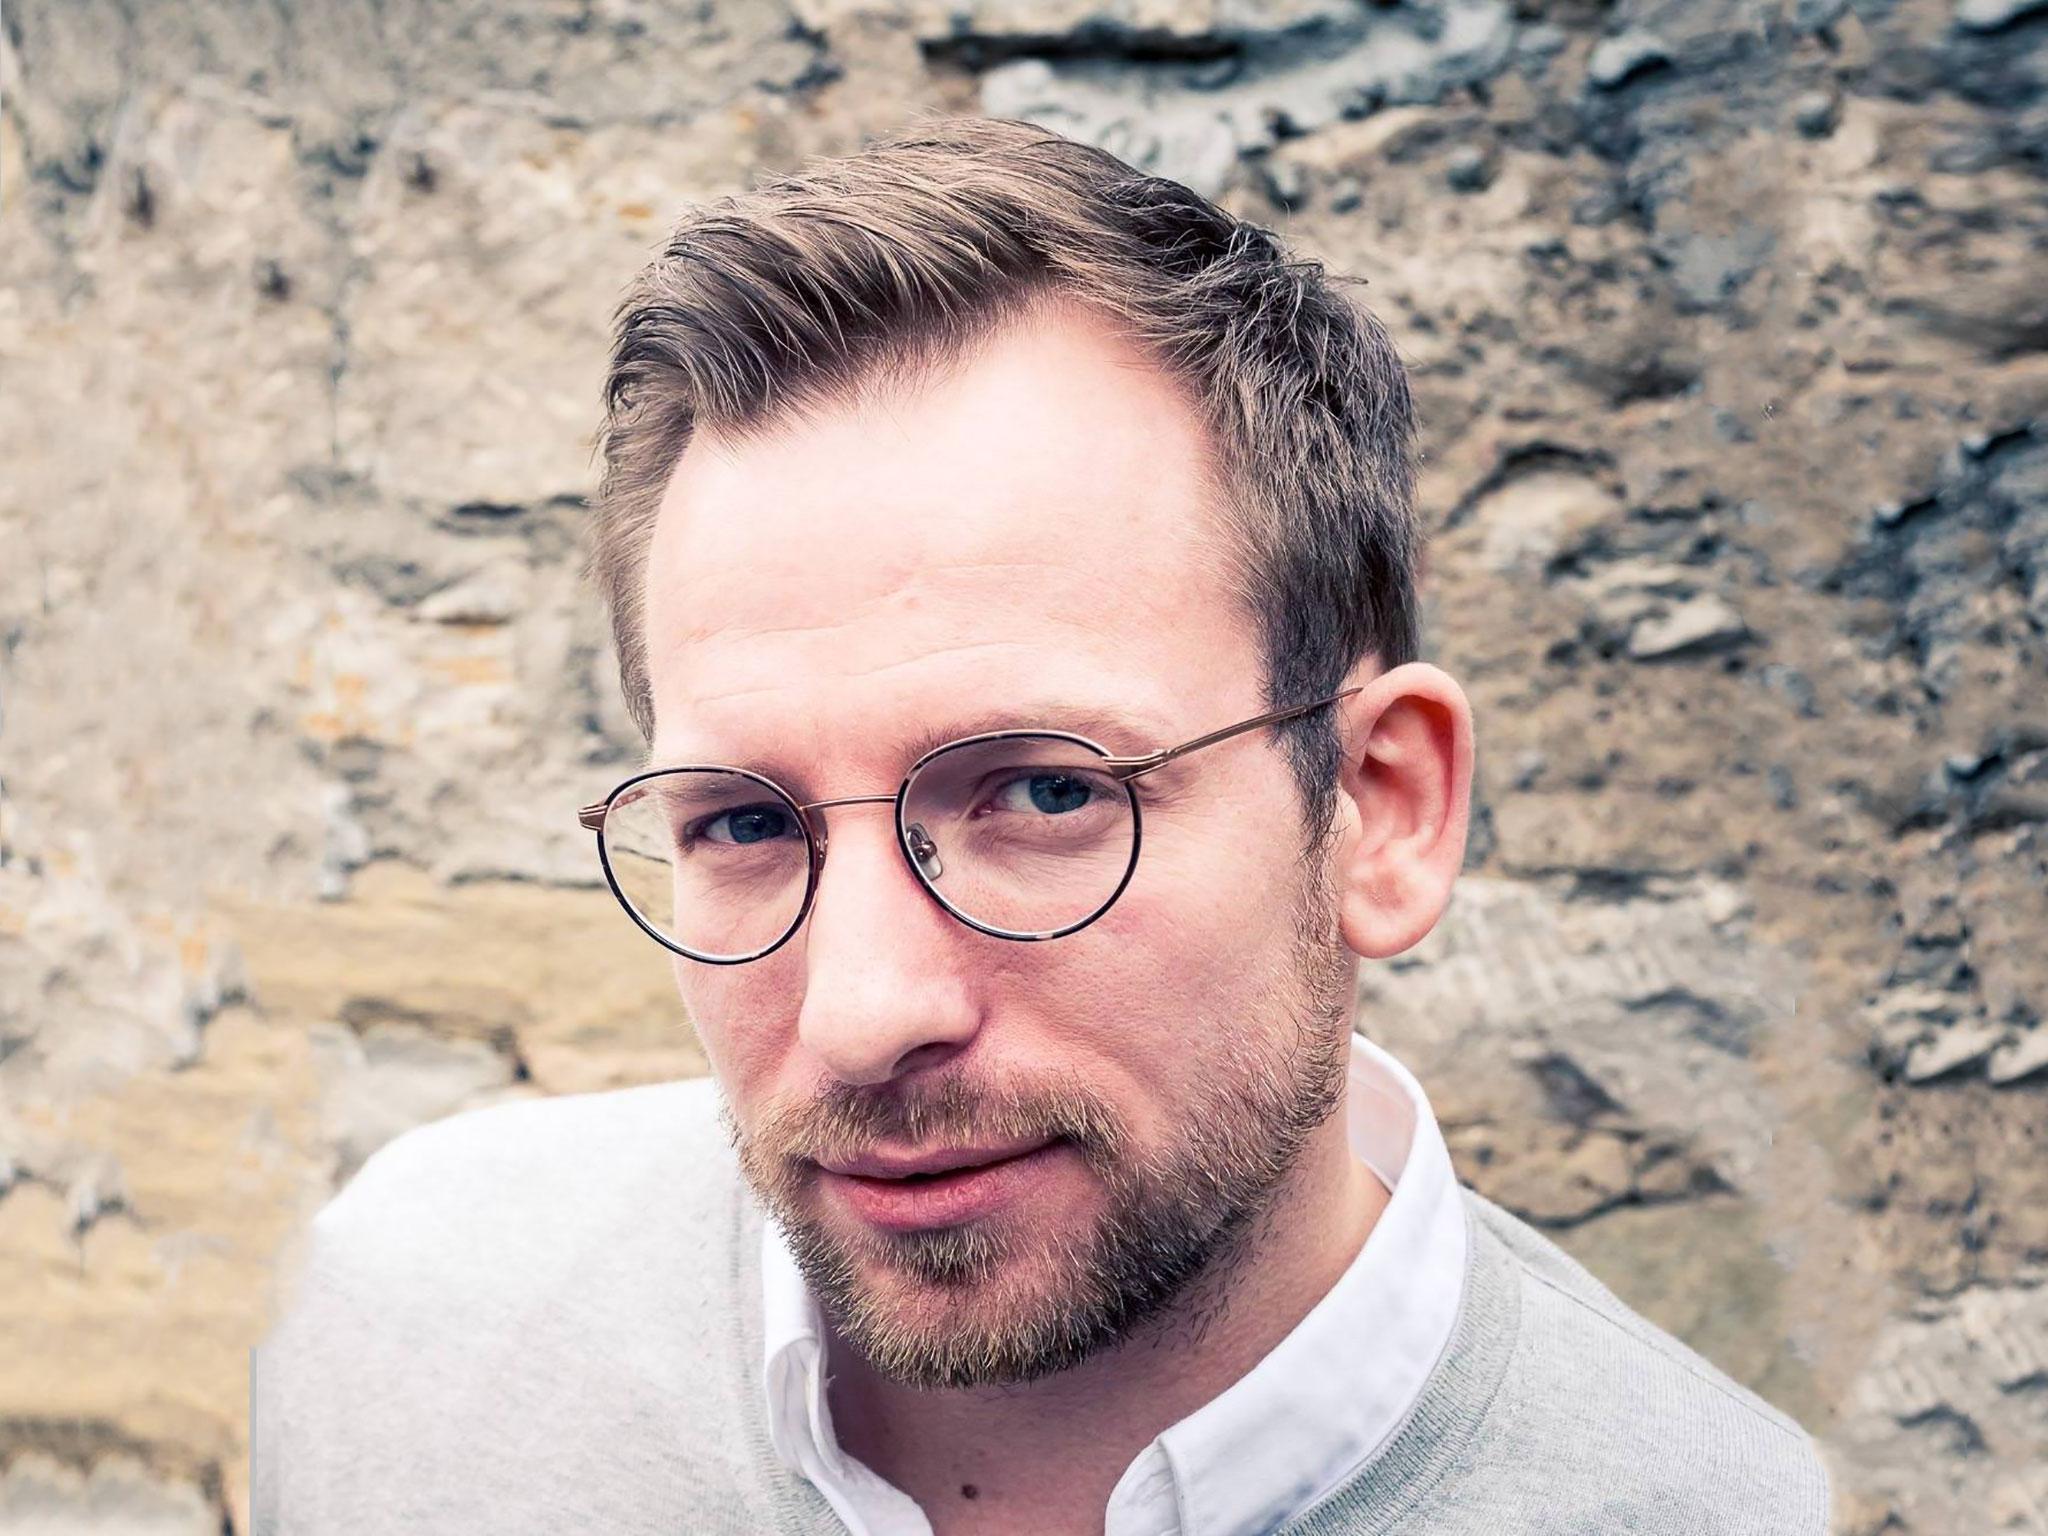 Symbolfoto Brille. Foto: Pascal Höfig